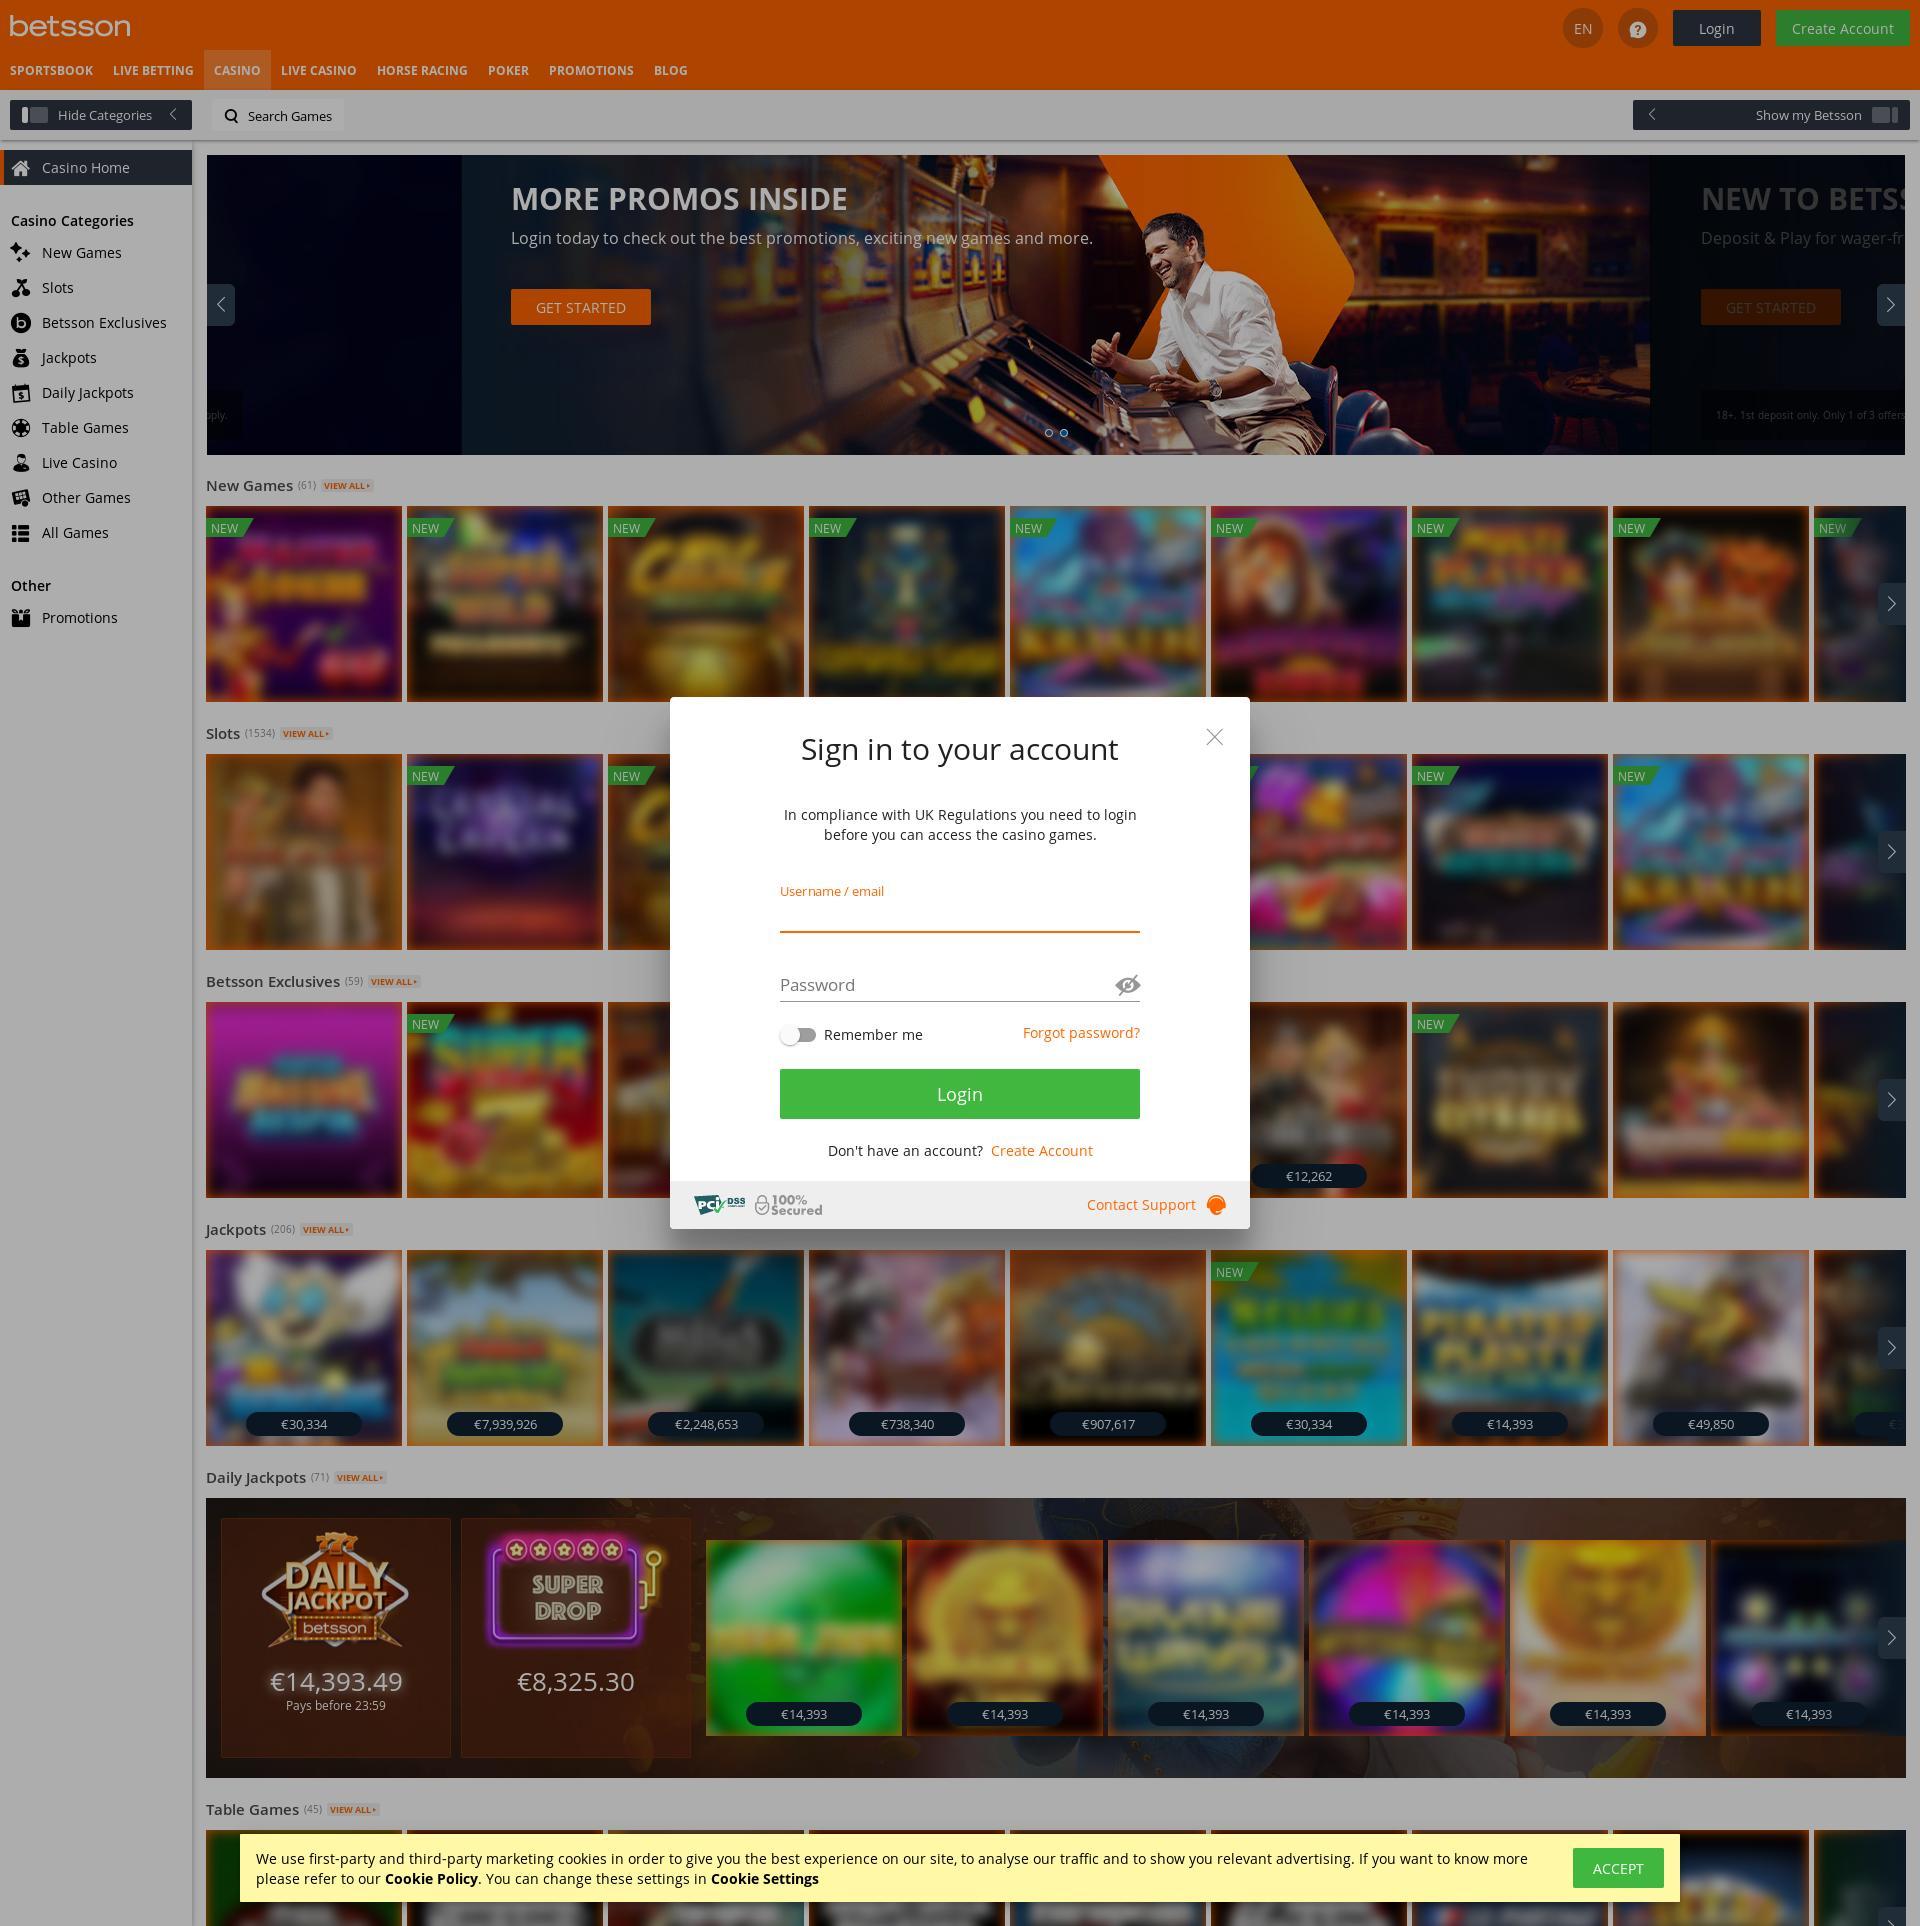 Casino screen Lobby 2020-02-15 for United Kingdom